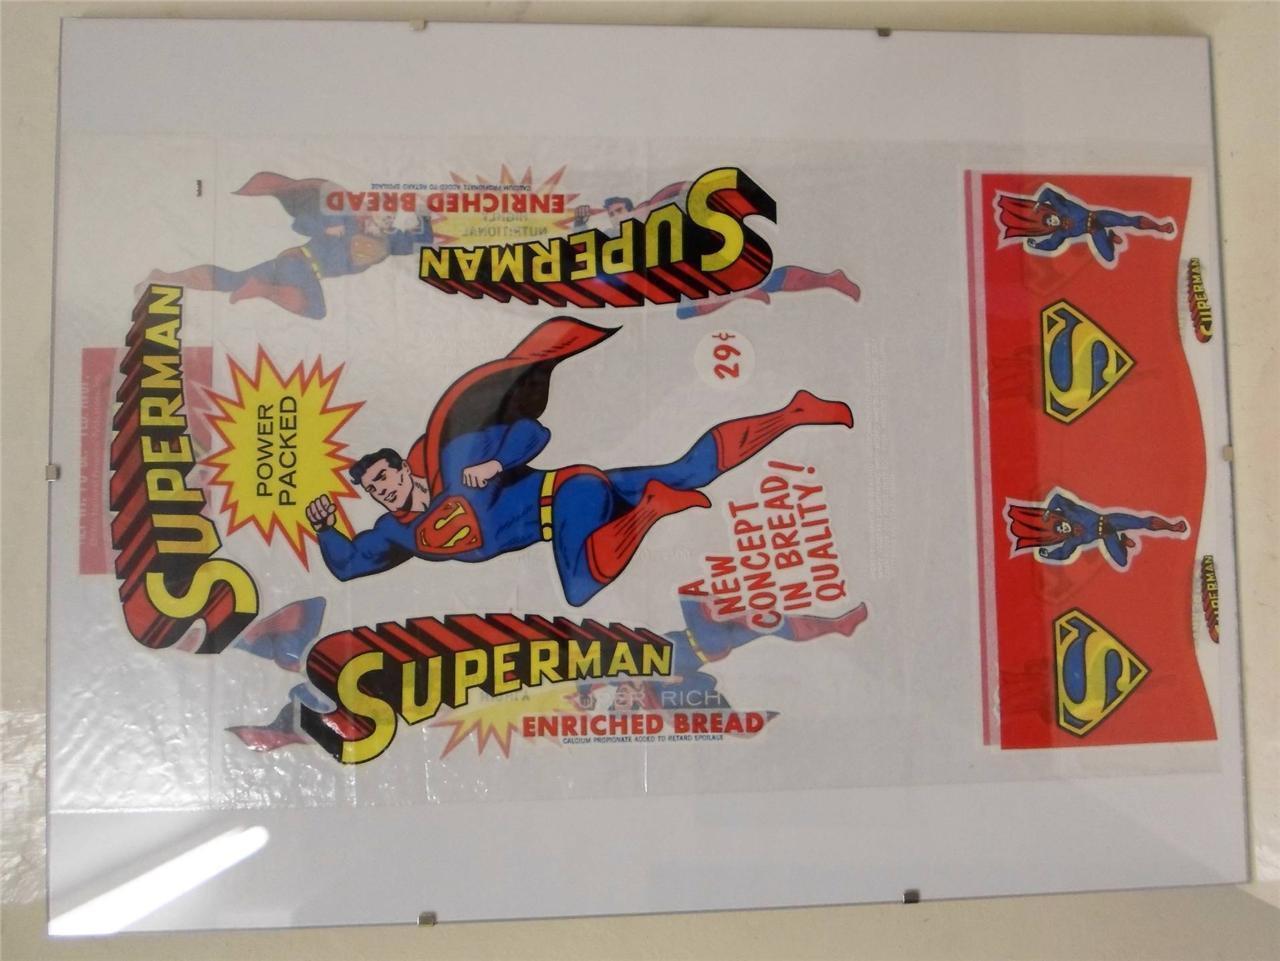 DC Promo ad SUPERMAN vintage USA BREAD WRAPPER from circa 1966 comic book style